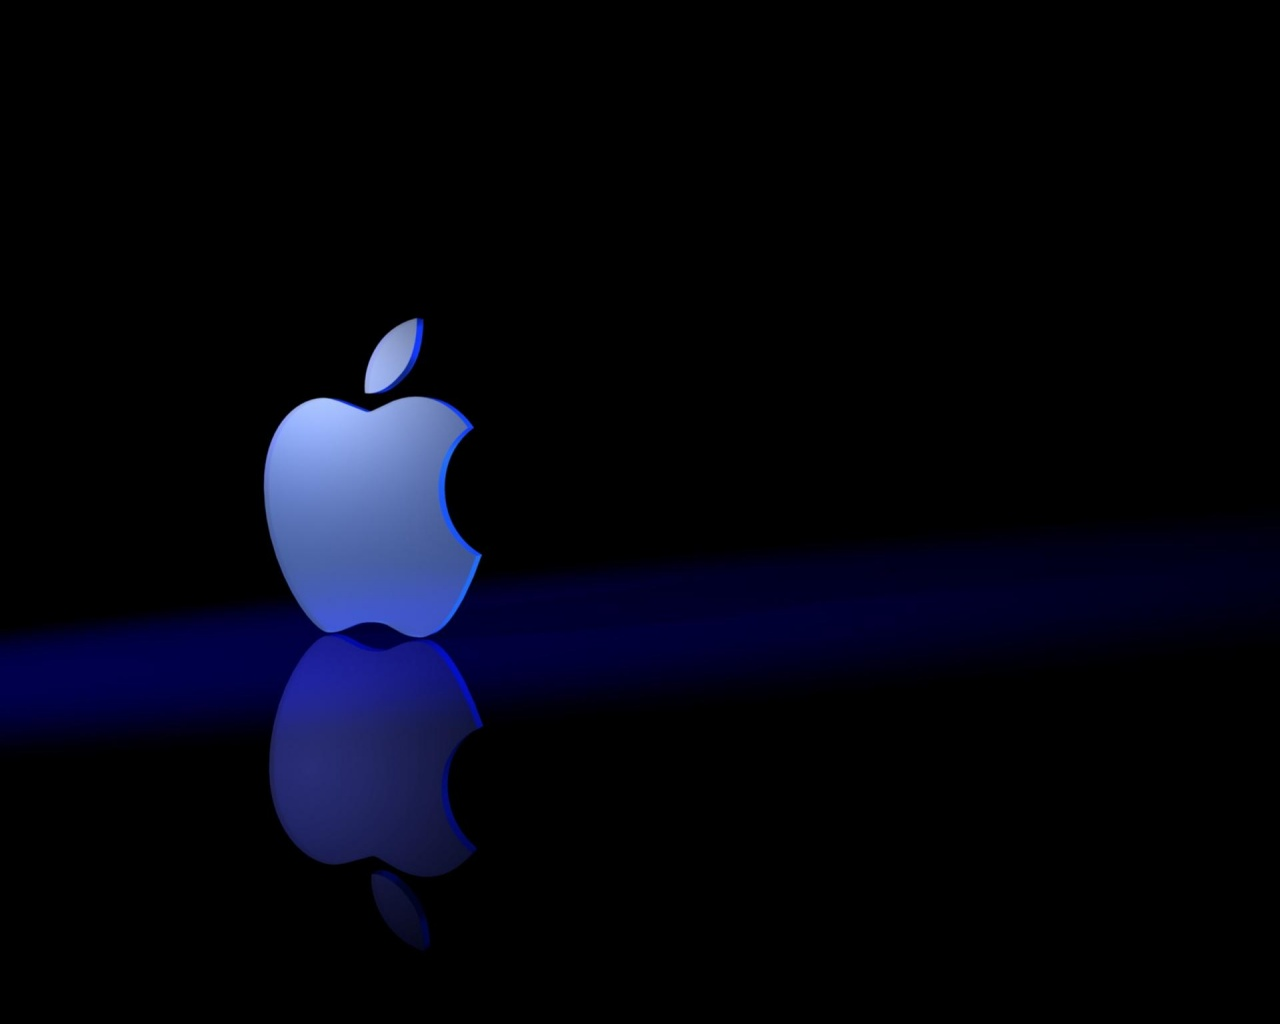 1280x1024 Apple 3Dark desktop PC and Mac wallpaper 1280x1024